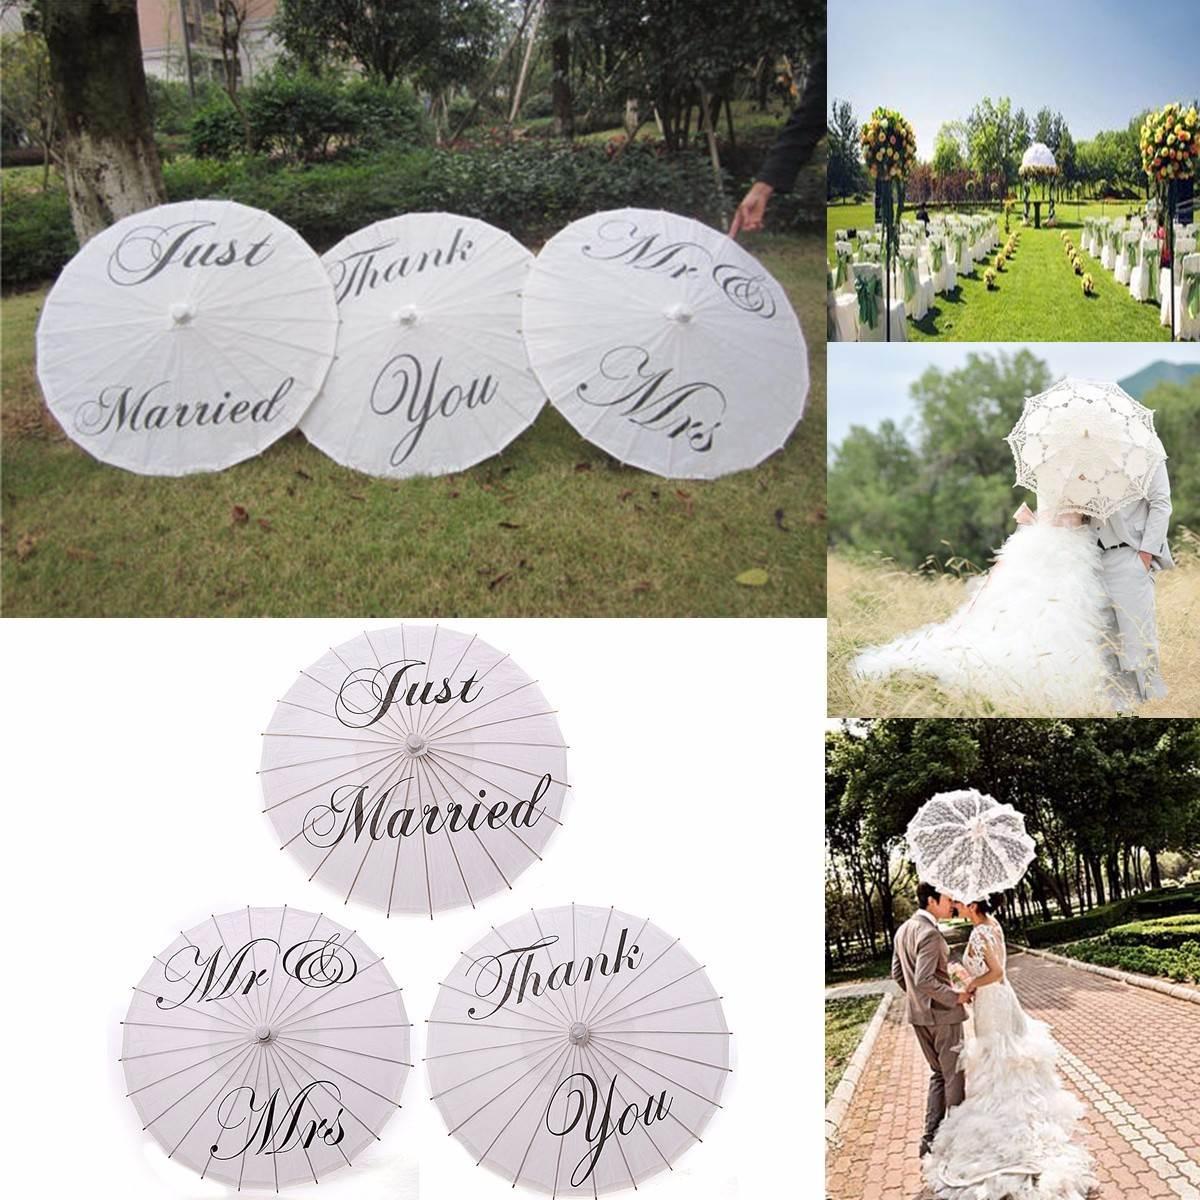 Bamboo 20.5'' Just Married Wedding Umbrella Parasol White Paper Mr & Mrs Wedding Bridal Favor Parasol Adult Size(China (Mainland))